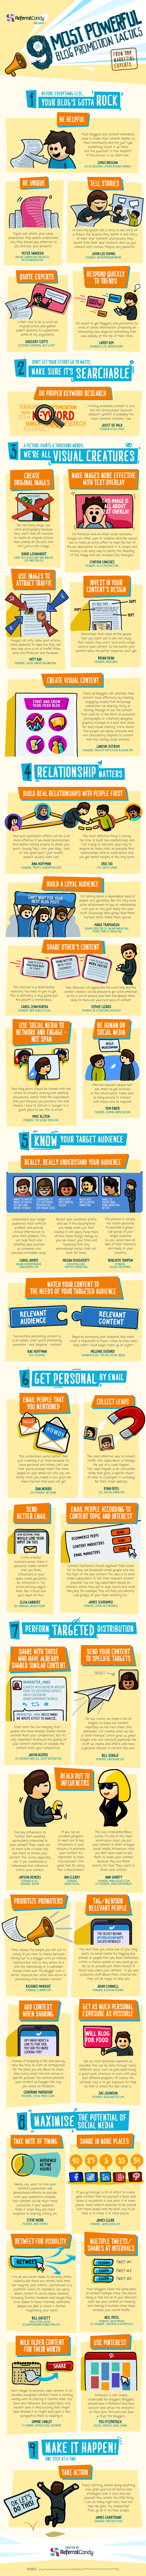 blog-promotion-tactics-infographic